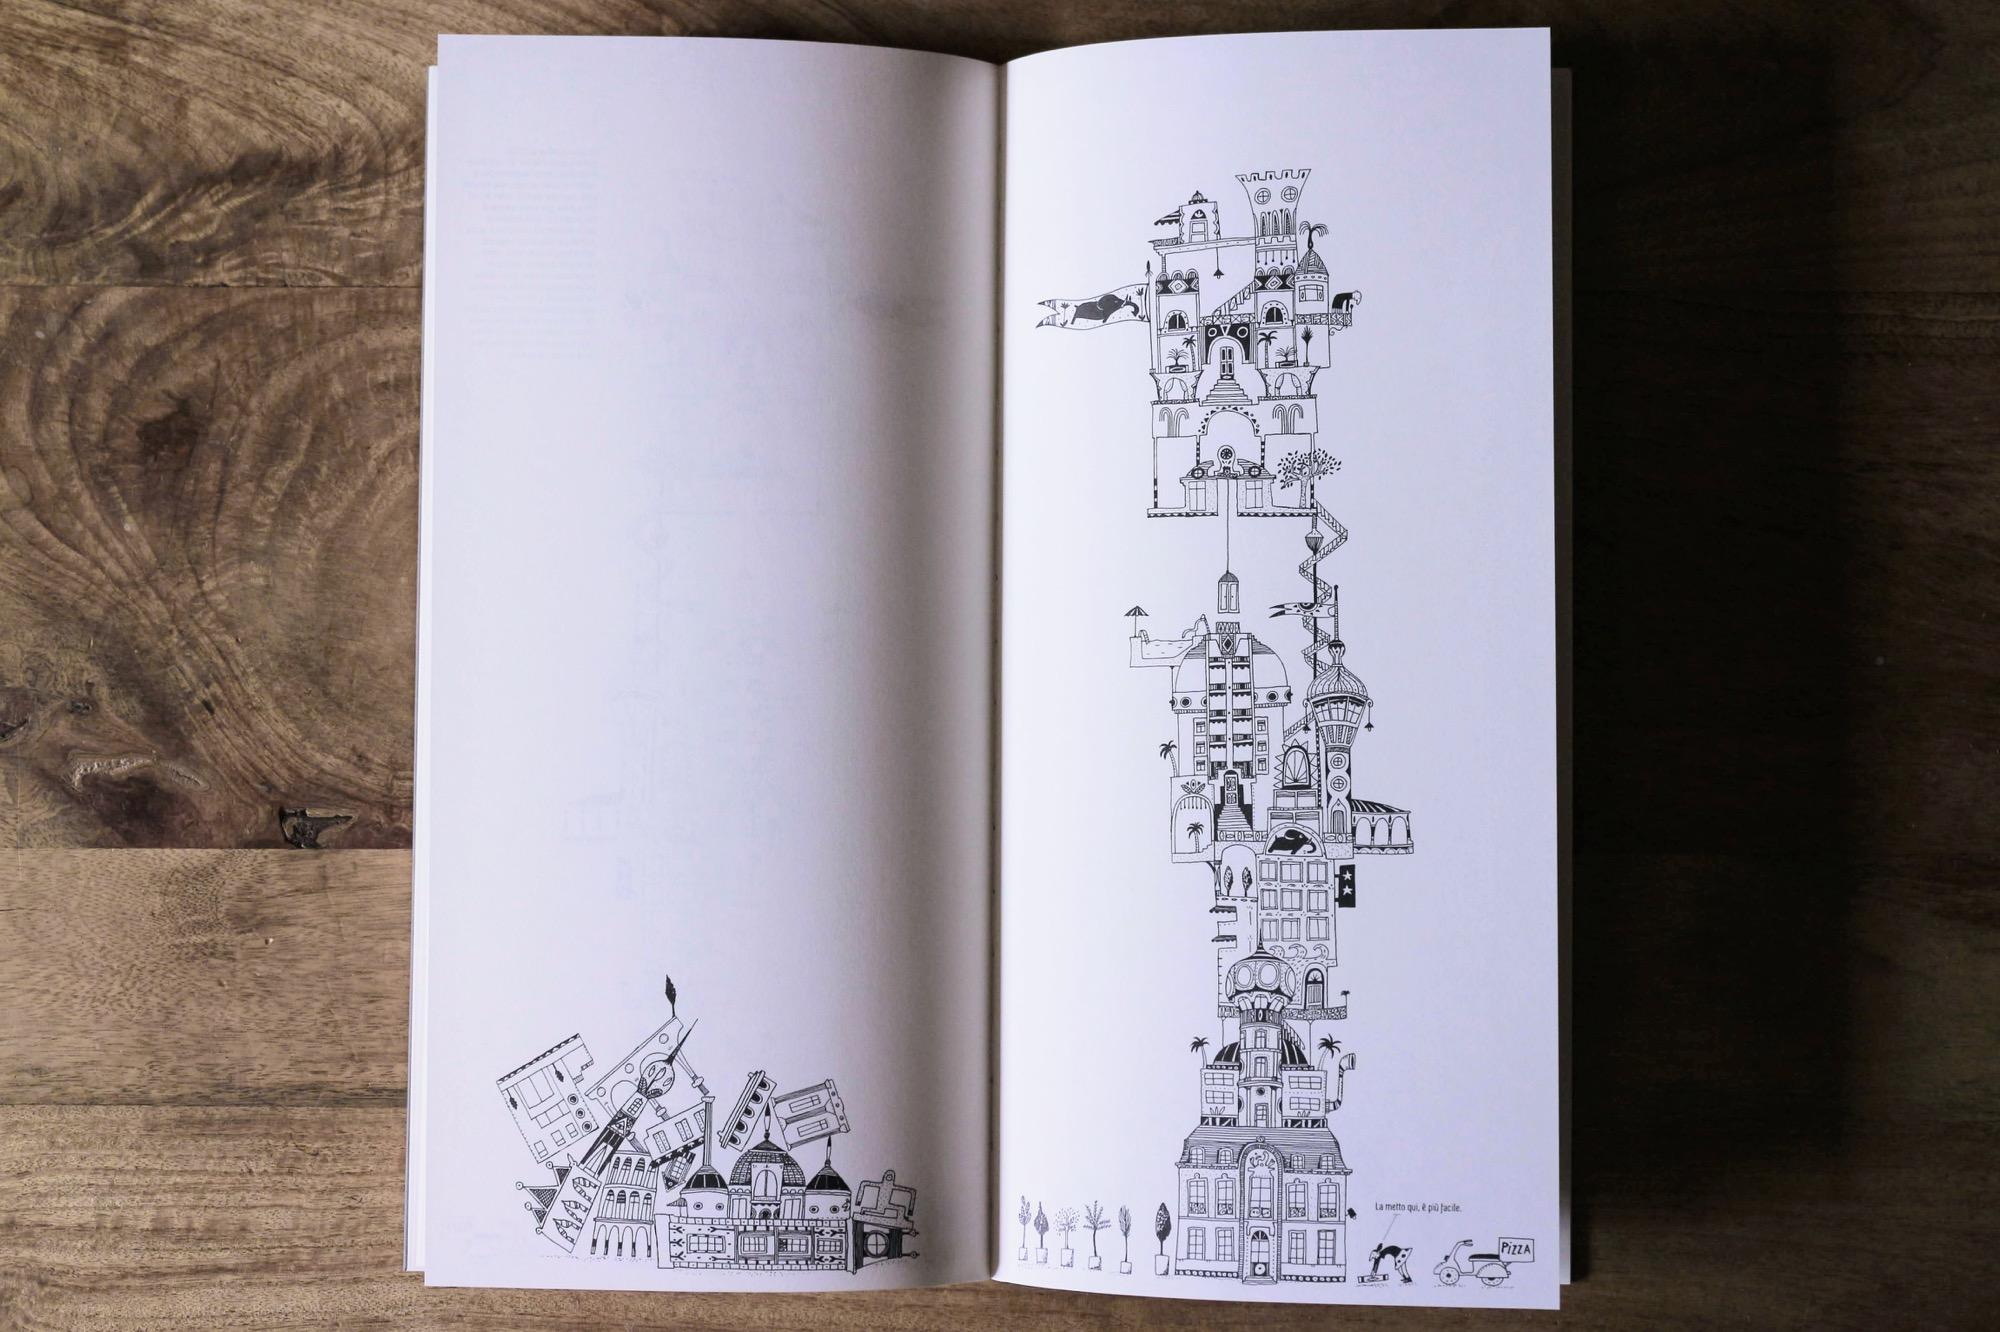 grattacieli 10